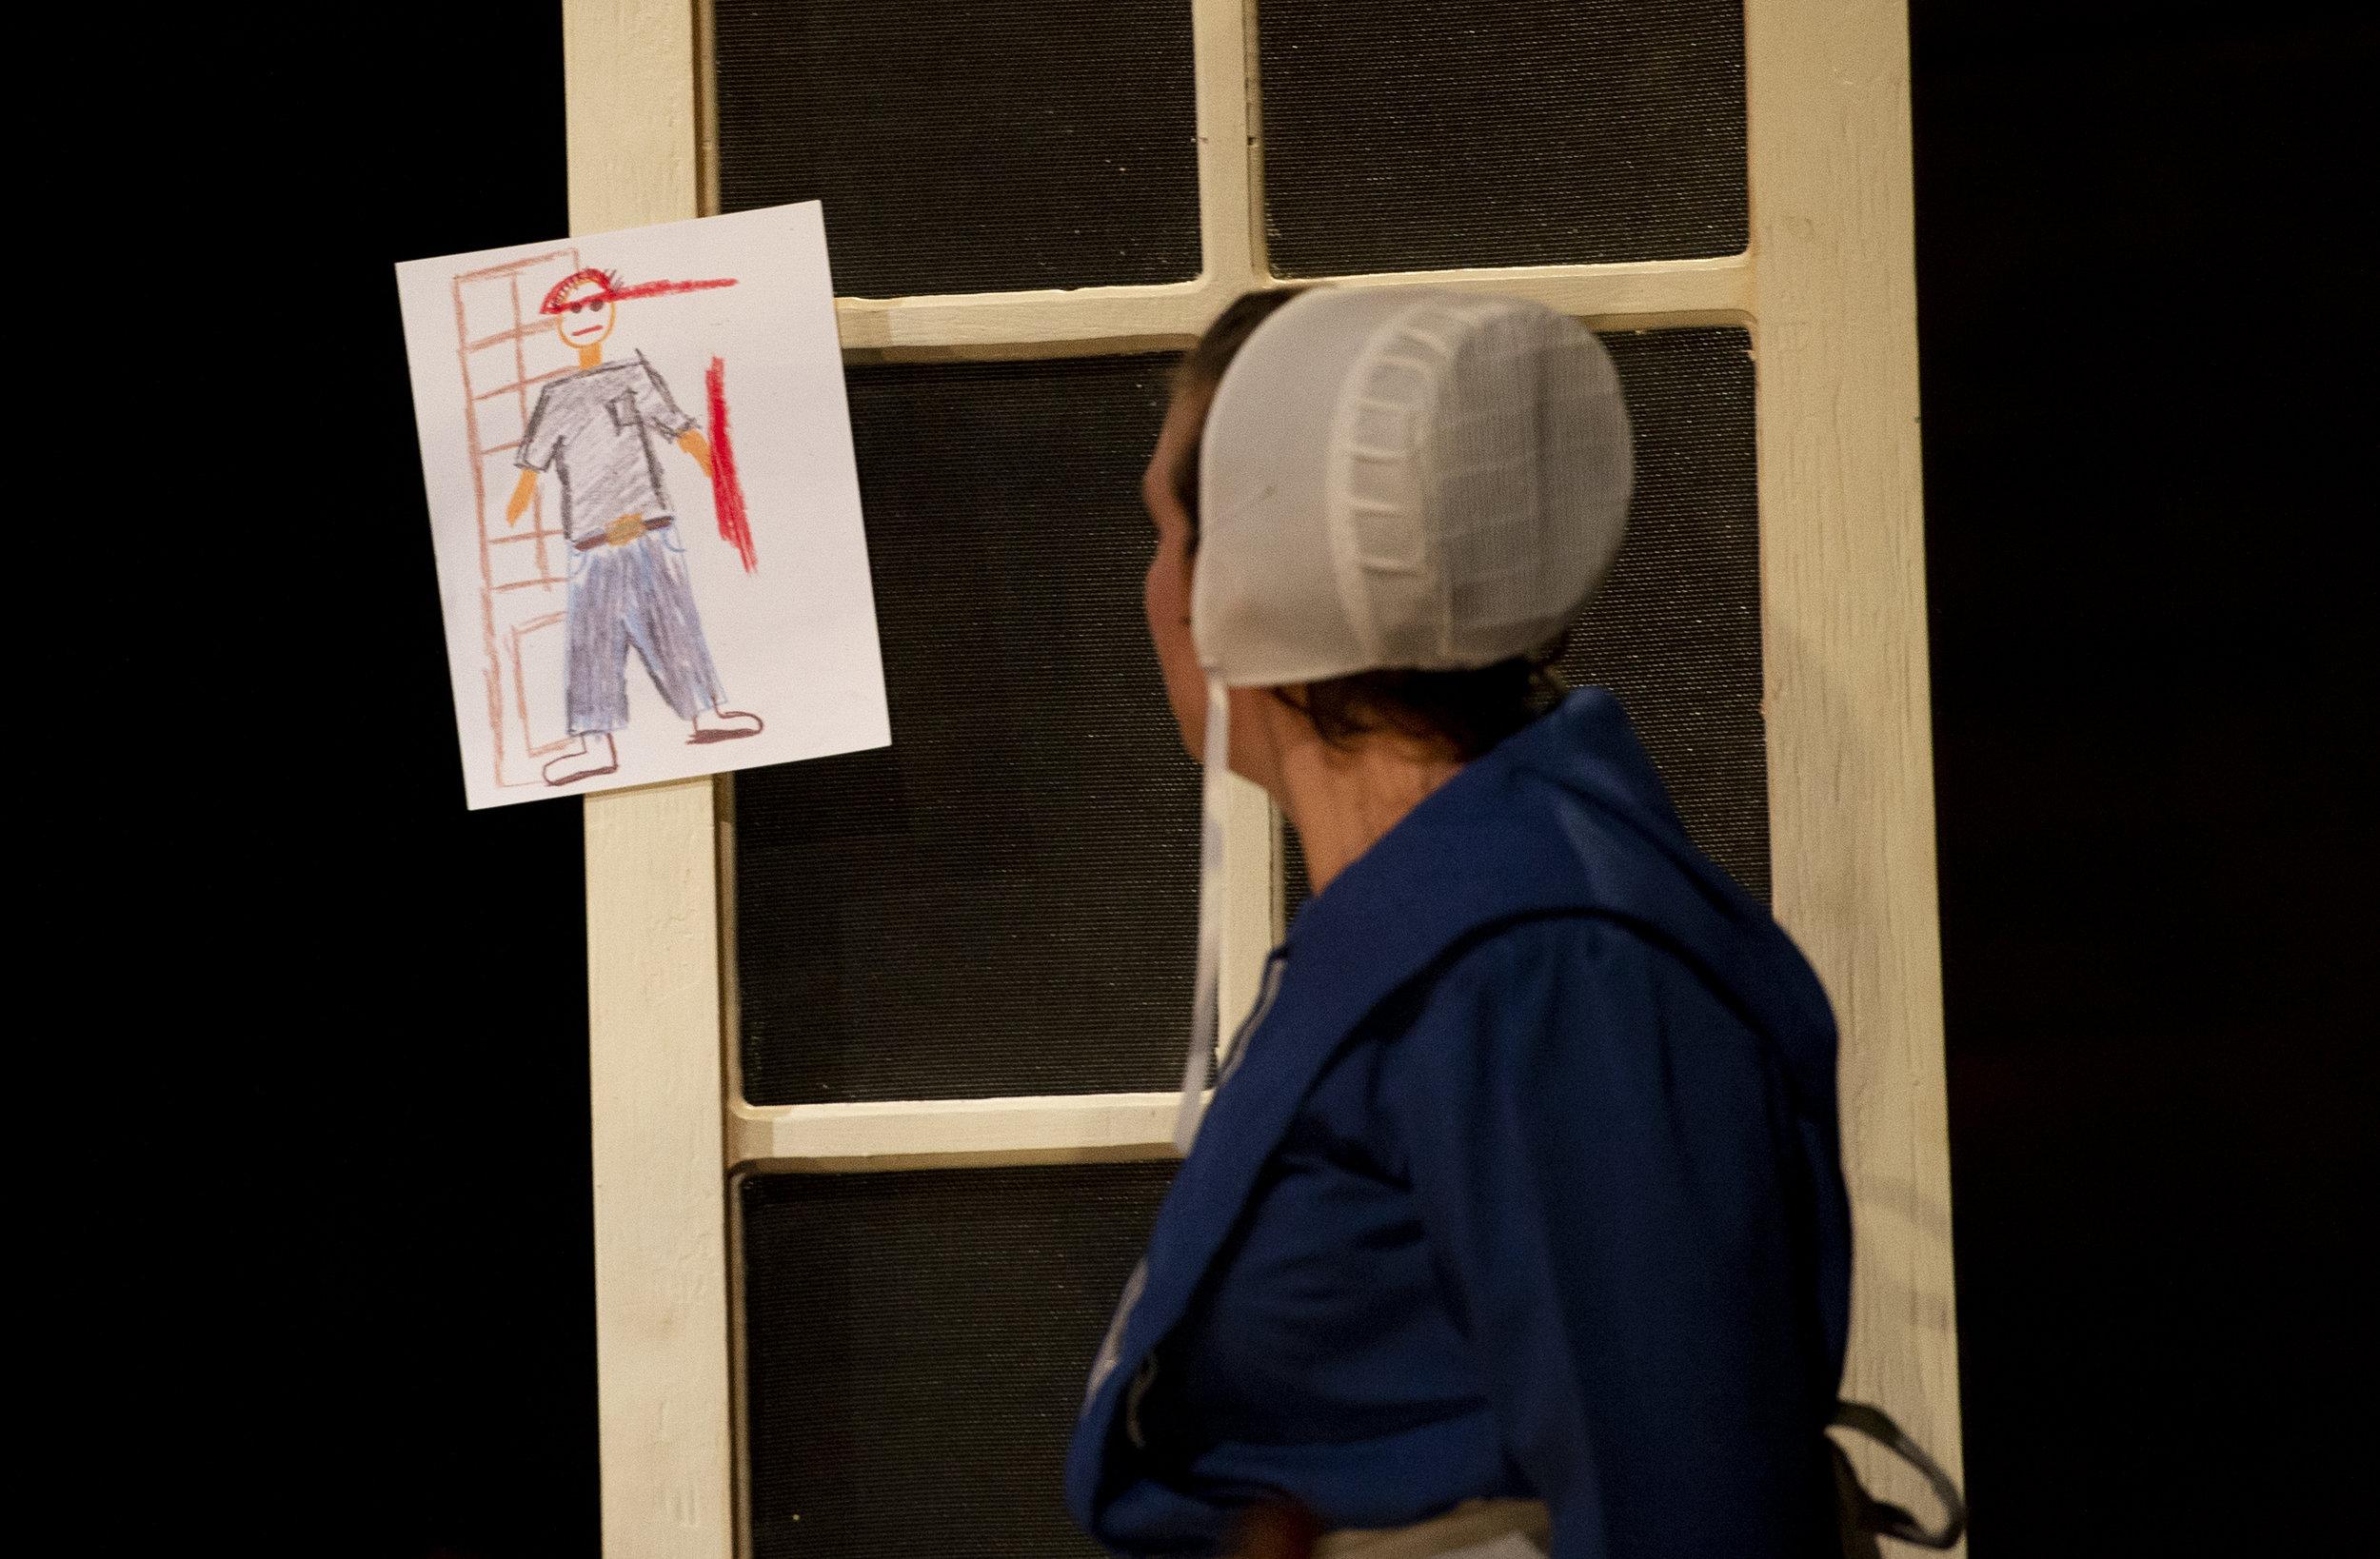 082018_AmishProject_DM_29.jpg